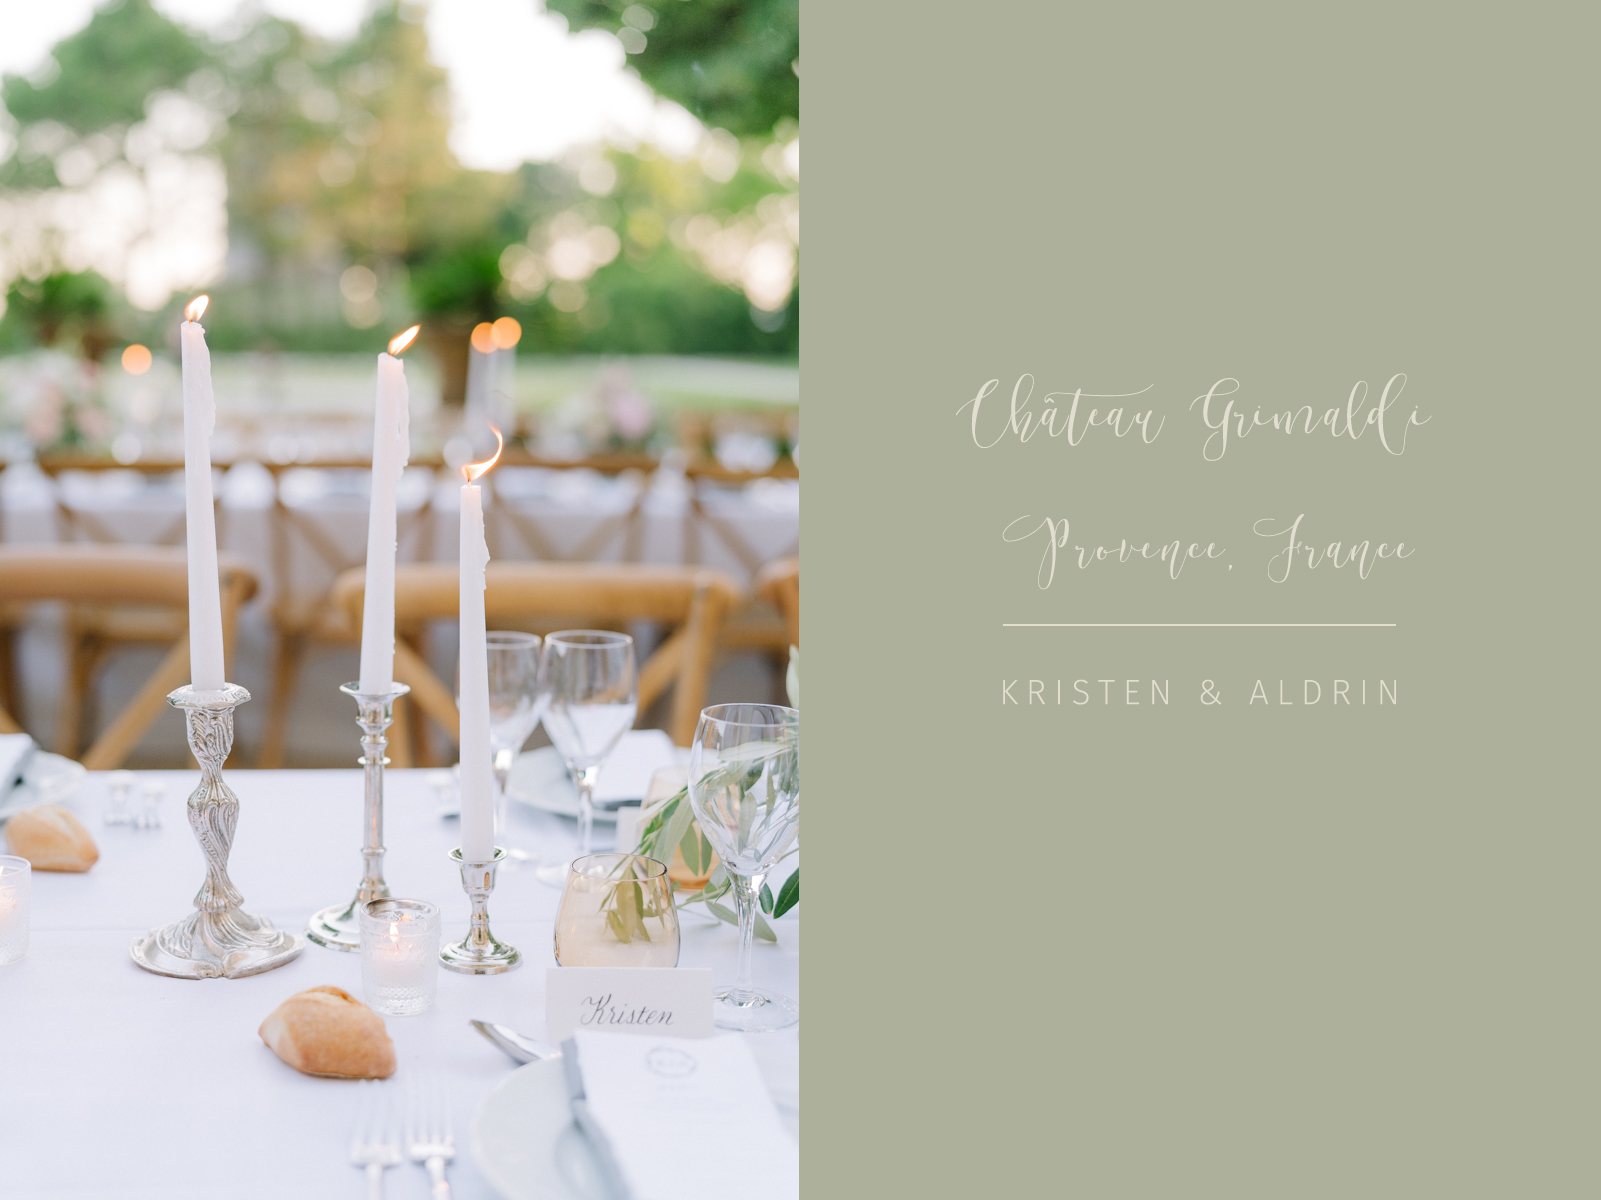 BohemeMoonPhotography-provence-wedding-photographer_00.jpg